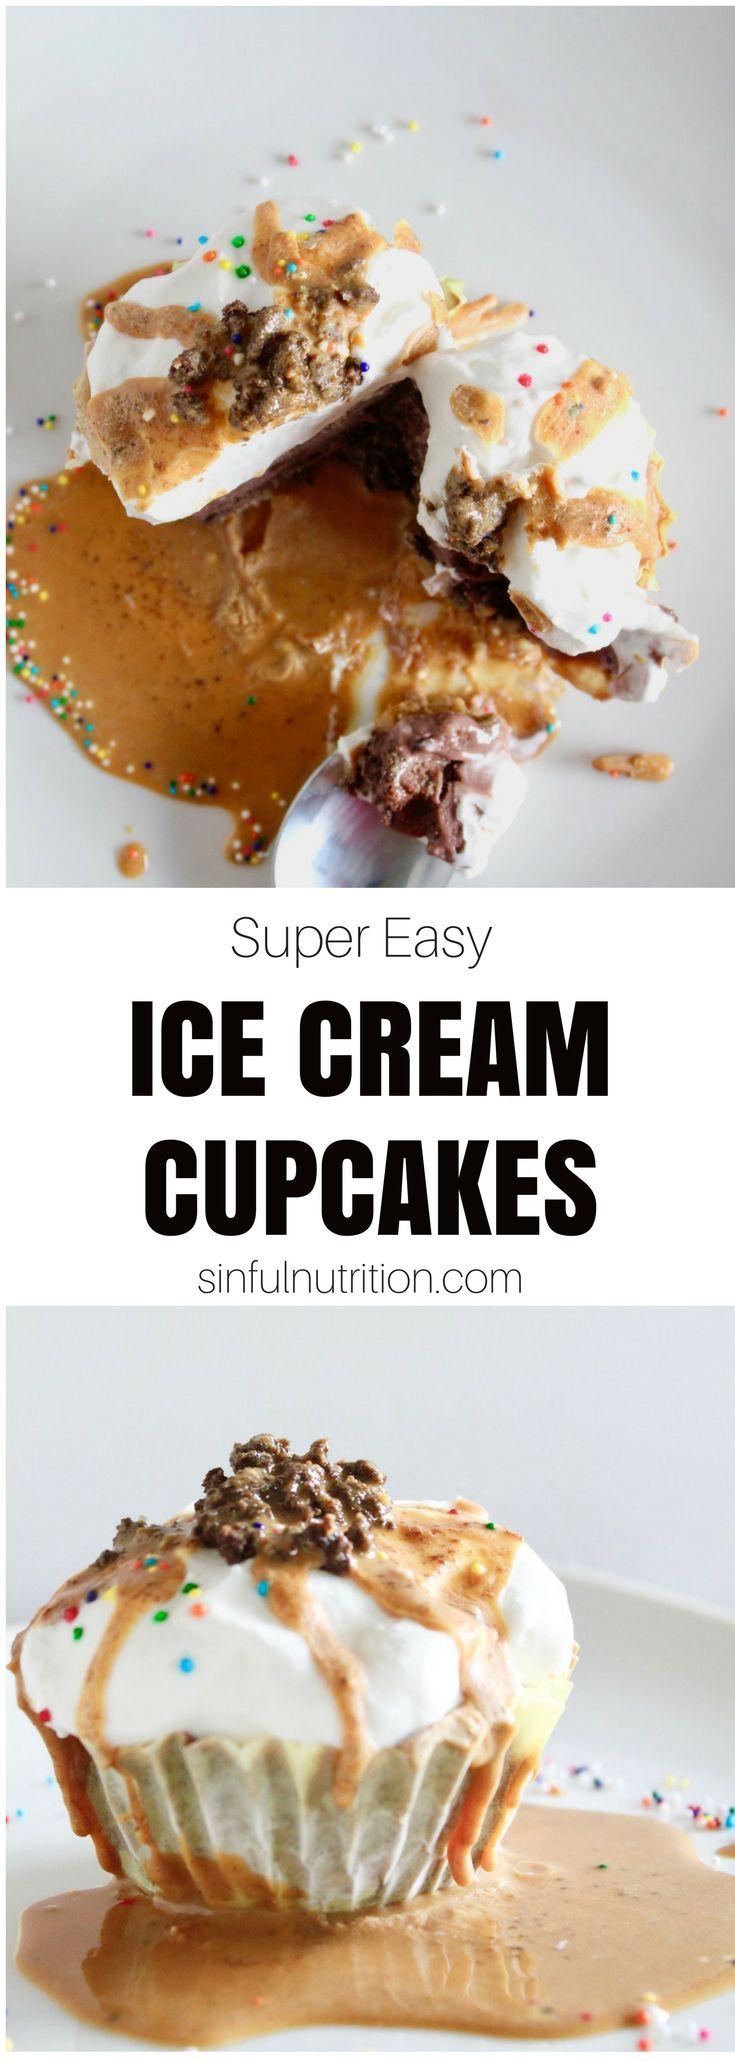 Ice Cream Cake Chocolate Crunchies Recipe